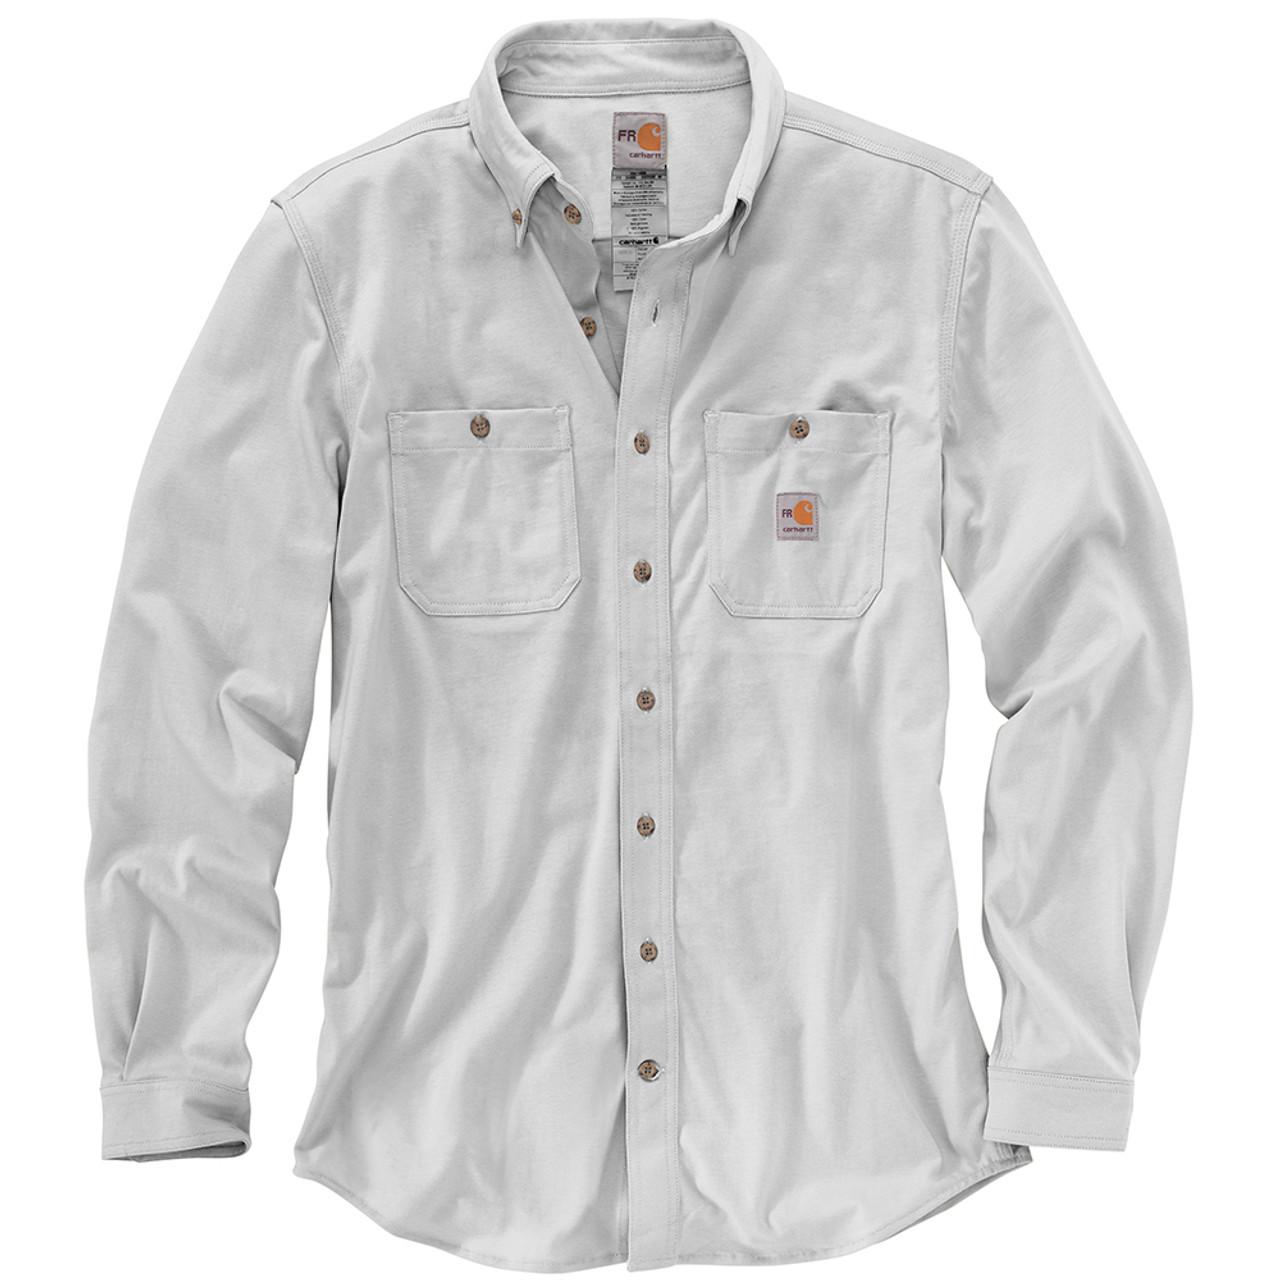 101698 Mens Flame Resistant Force Cotton Hybrid Shirt